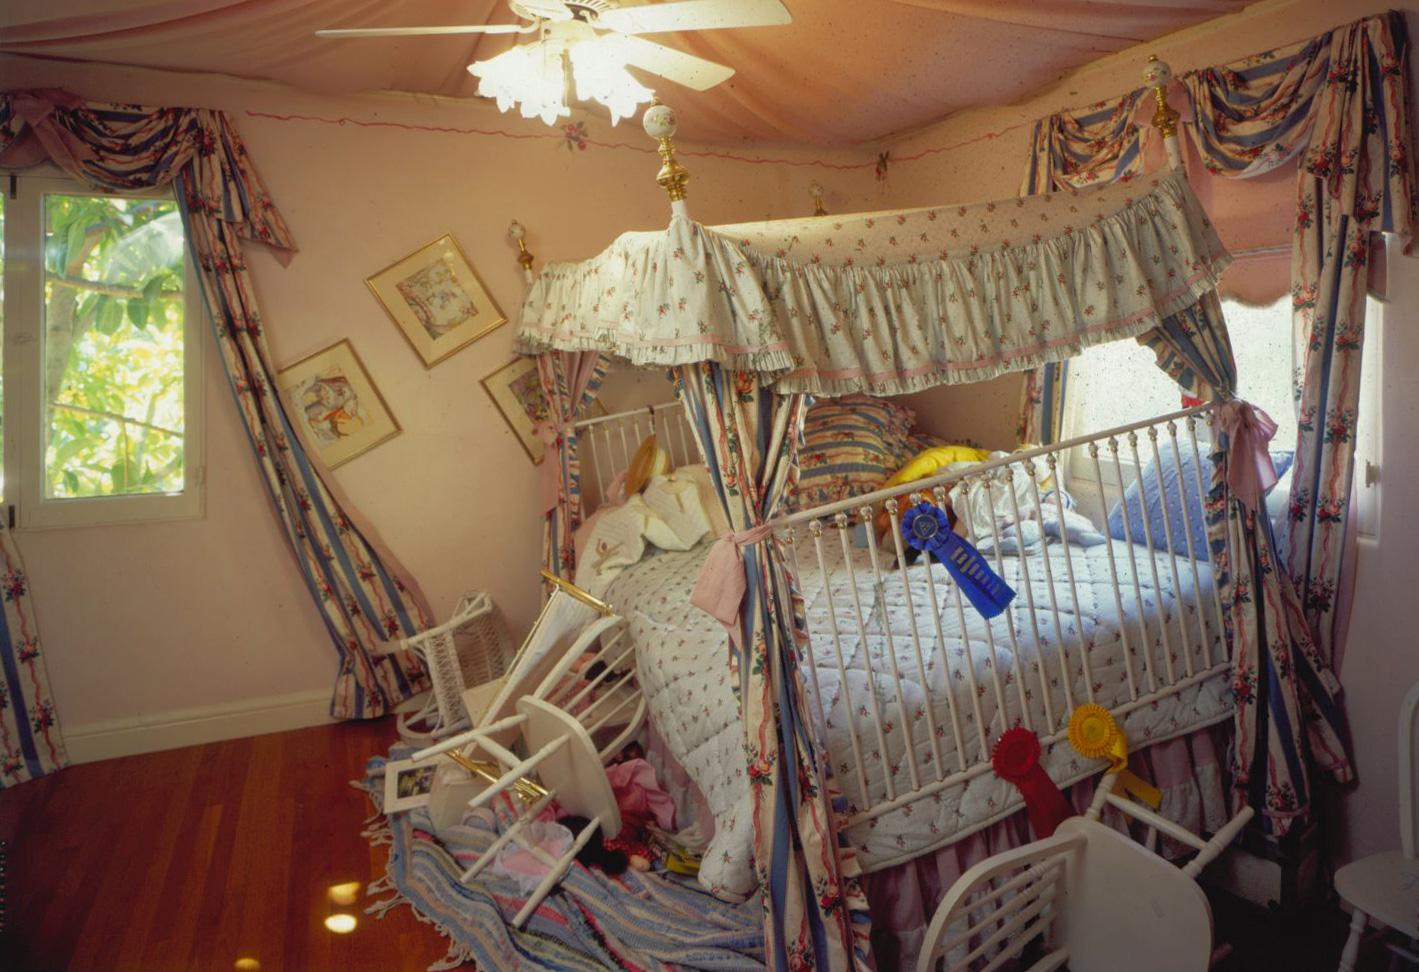 Martin kersels tumble room decor